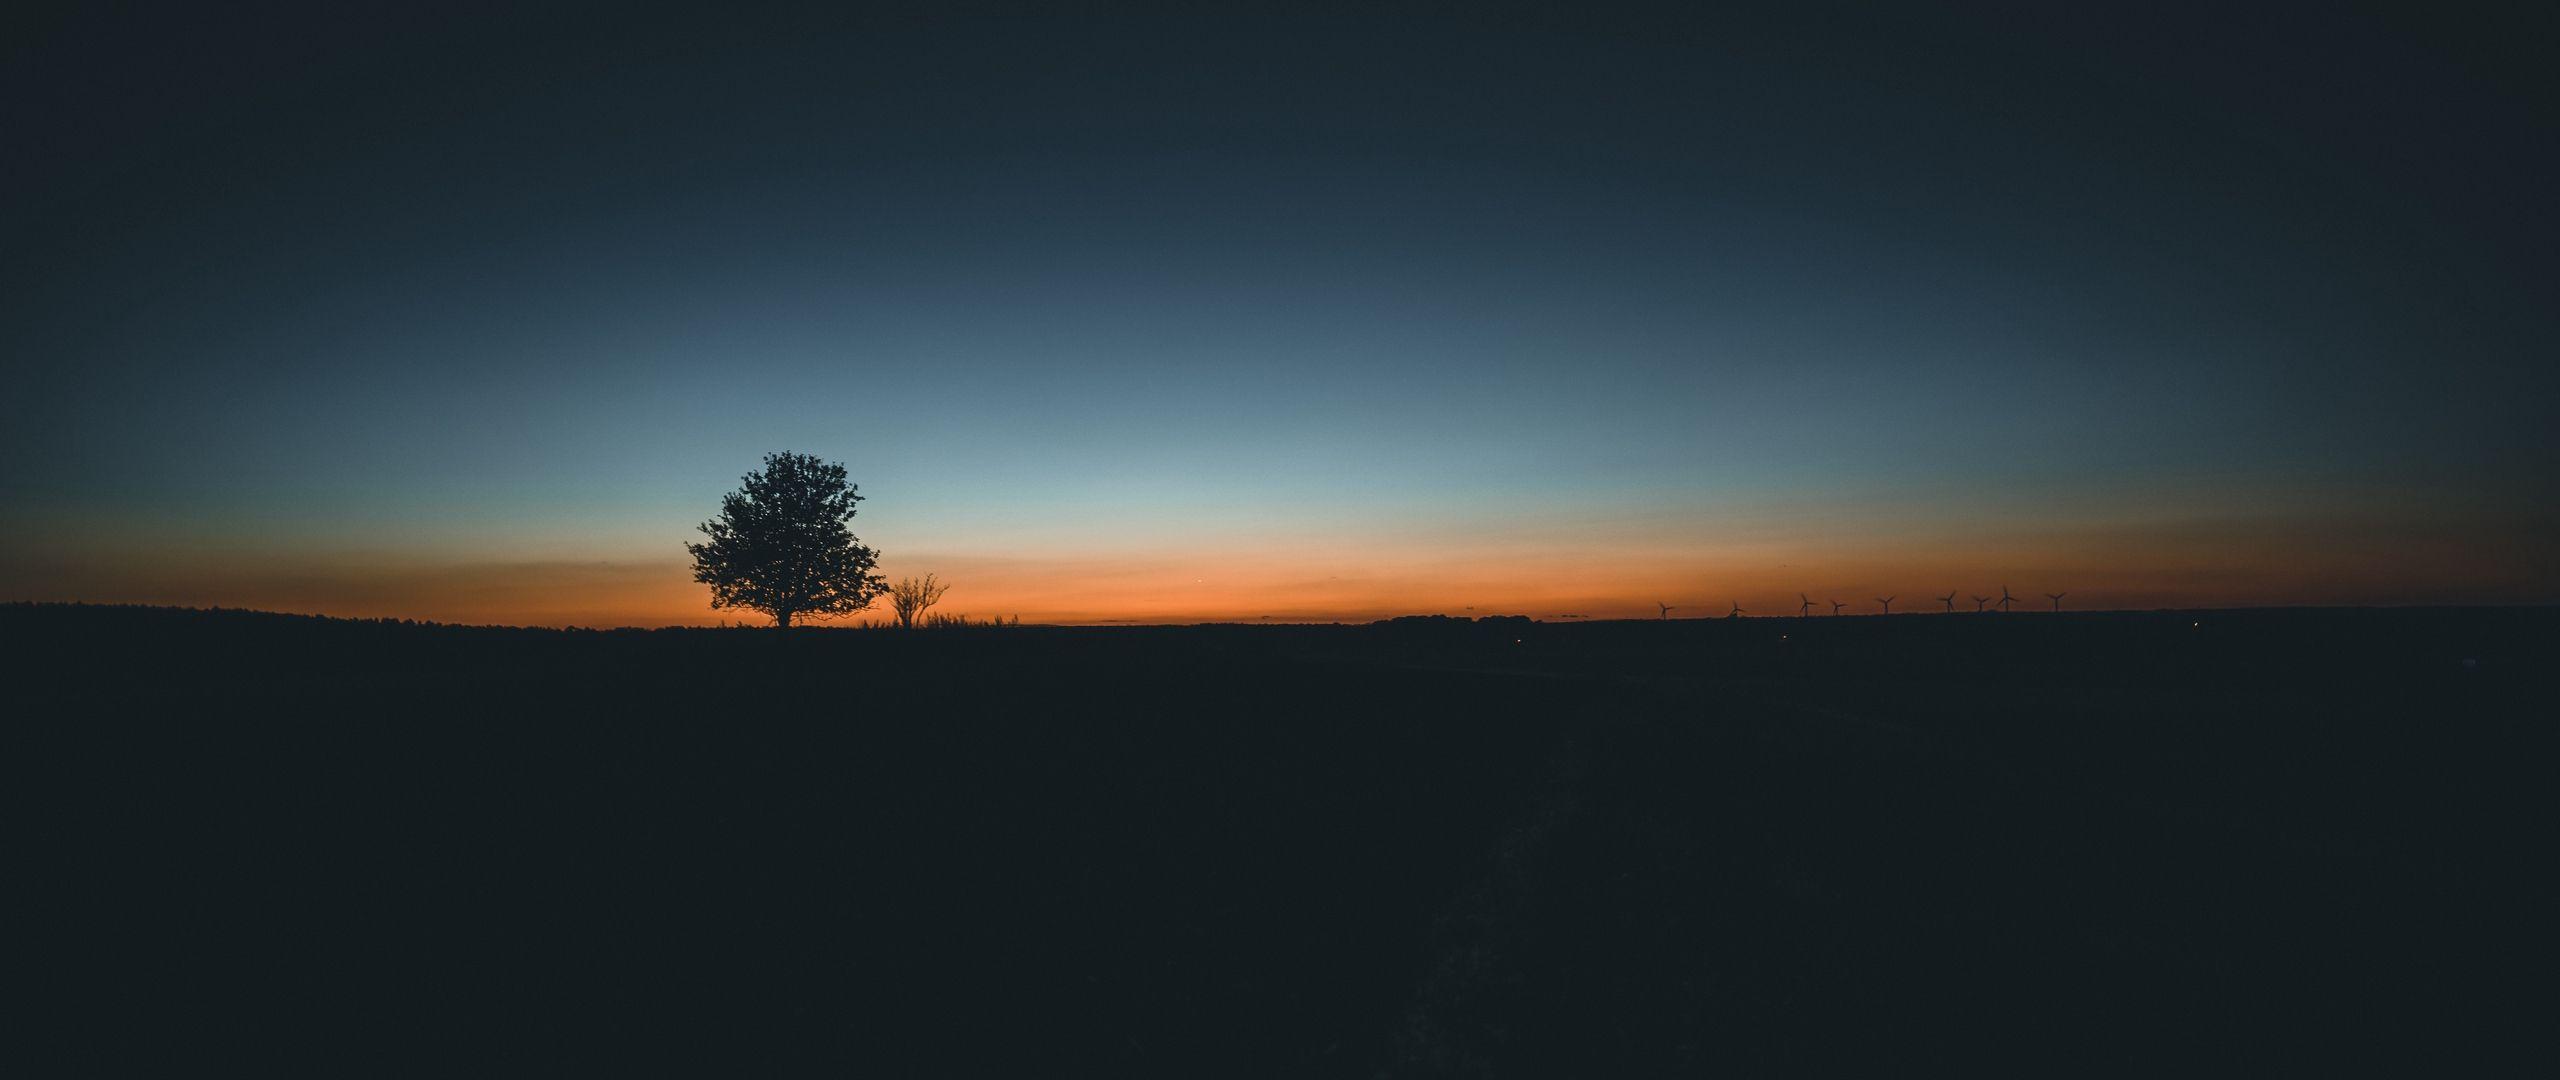 2560x1080 Download wallpaper 2560x1080 tree, horizon, minimalism, sunset